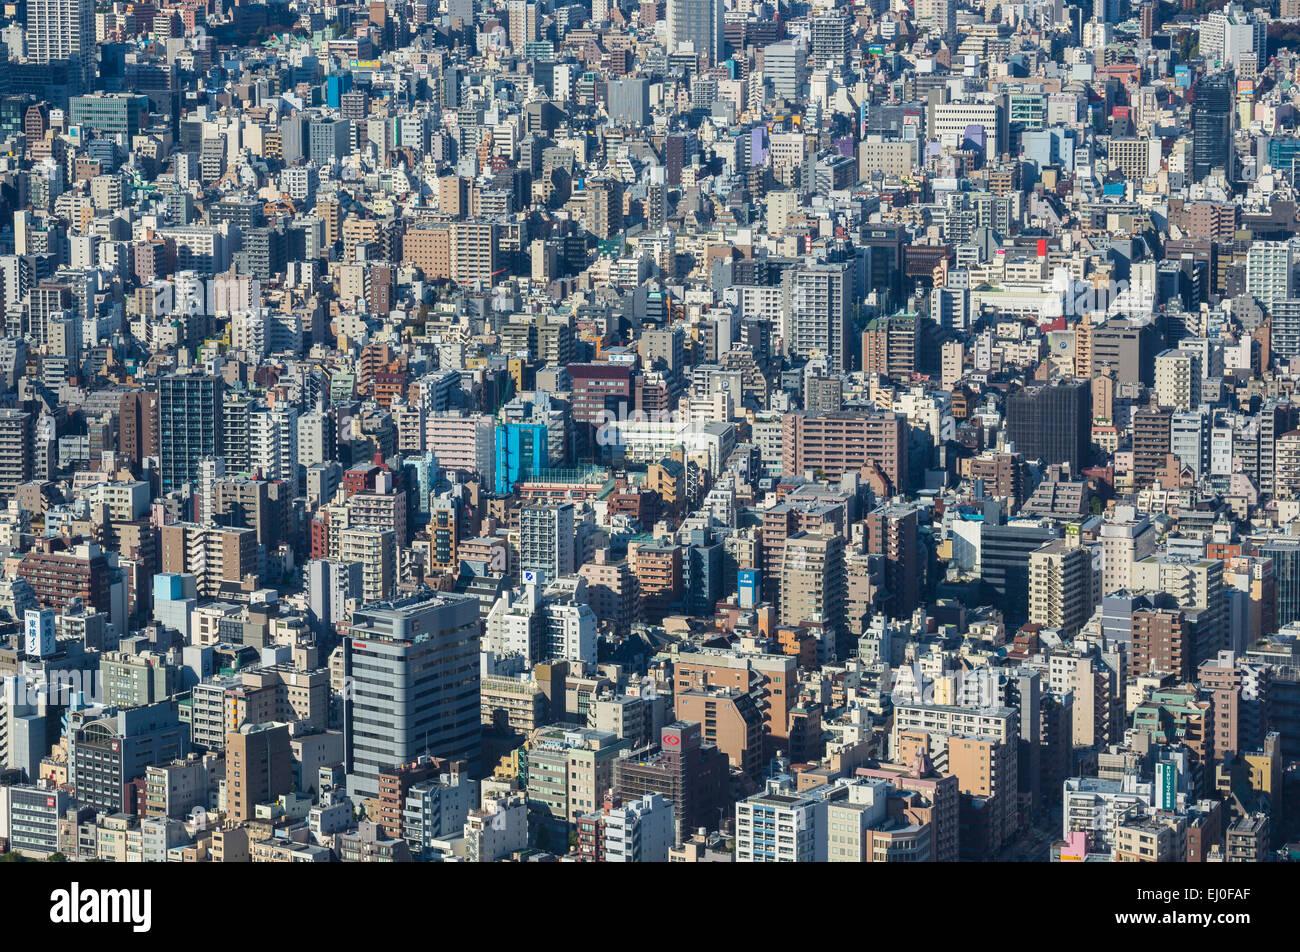 Japan, Asia, Kanto, Taito ku, Tokyo, City, aerial, architecture, building, metropolis, no people, urban - Stock Image